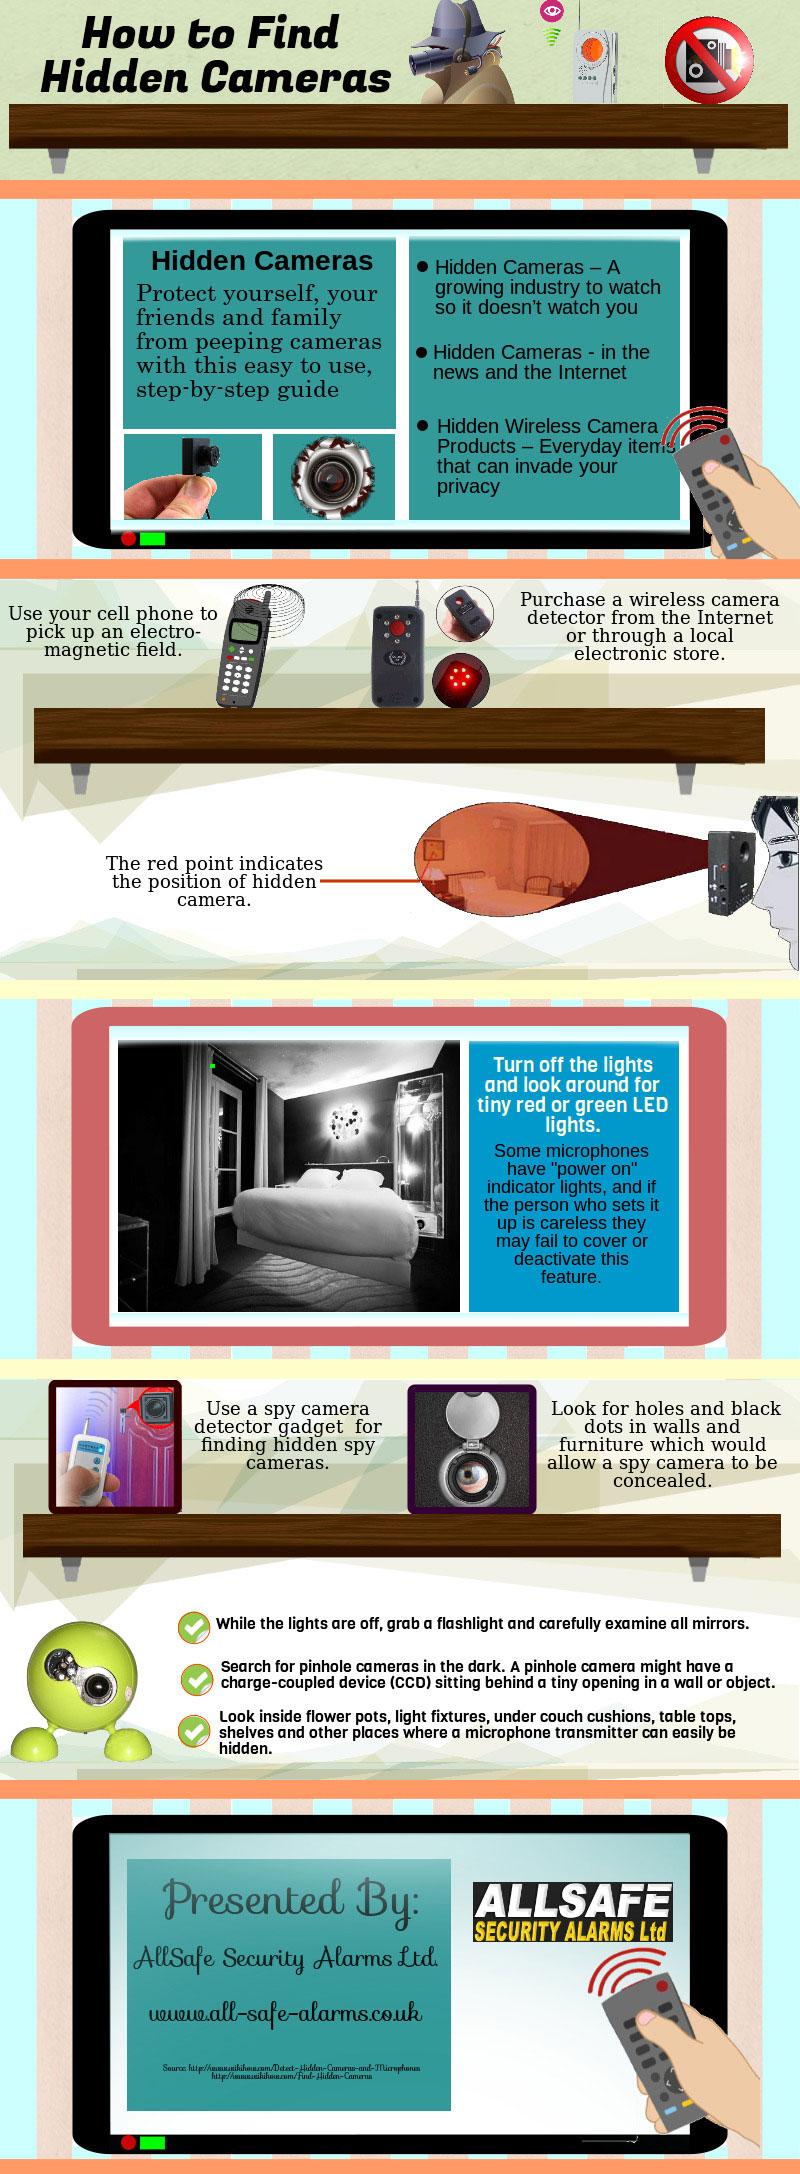 how-find-hidden-cameras-infographic